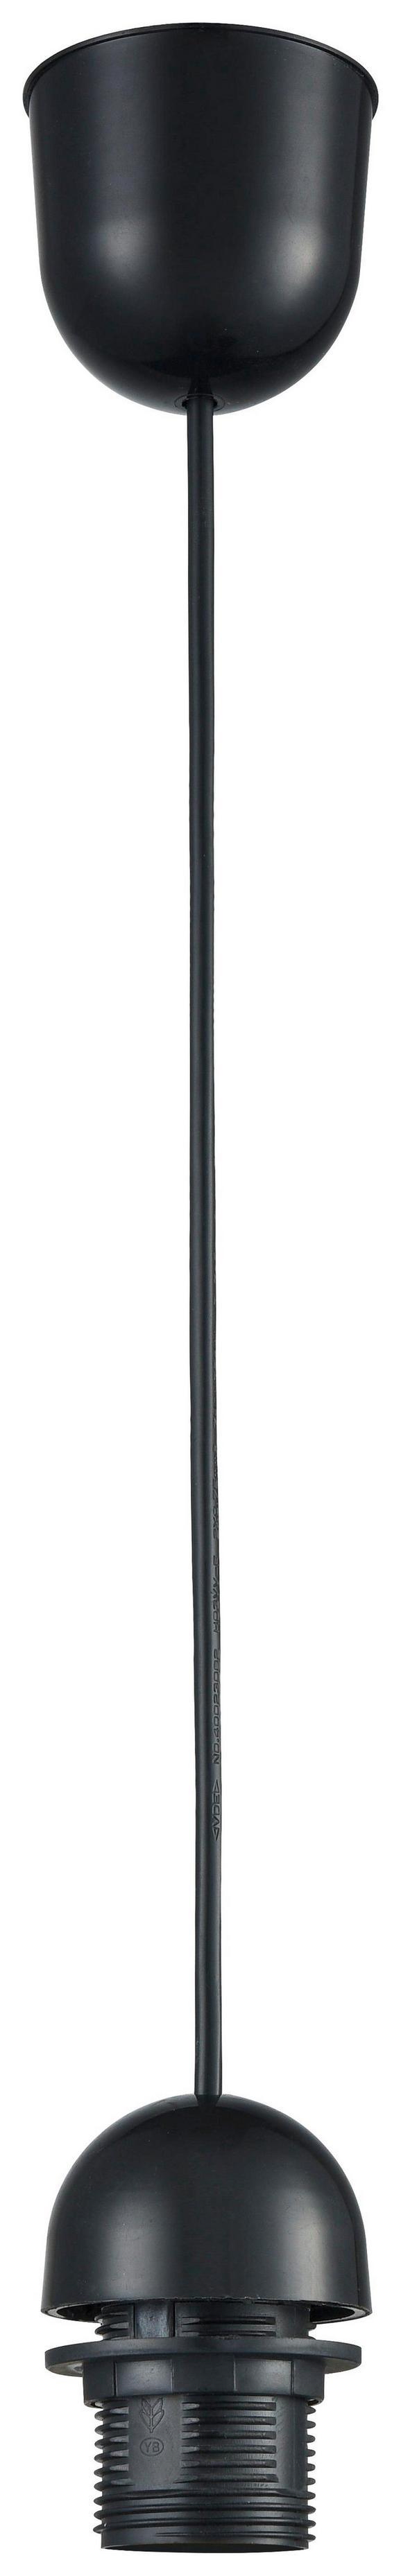 Schnurpendel Anita, max. 60 Watt - Schwarz, Kunststoff (150cm) - Mömax modern living